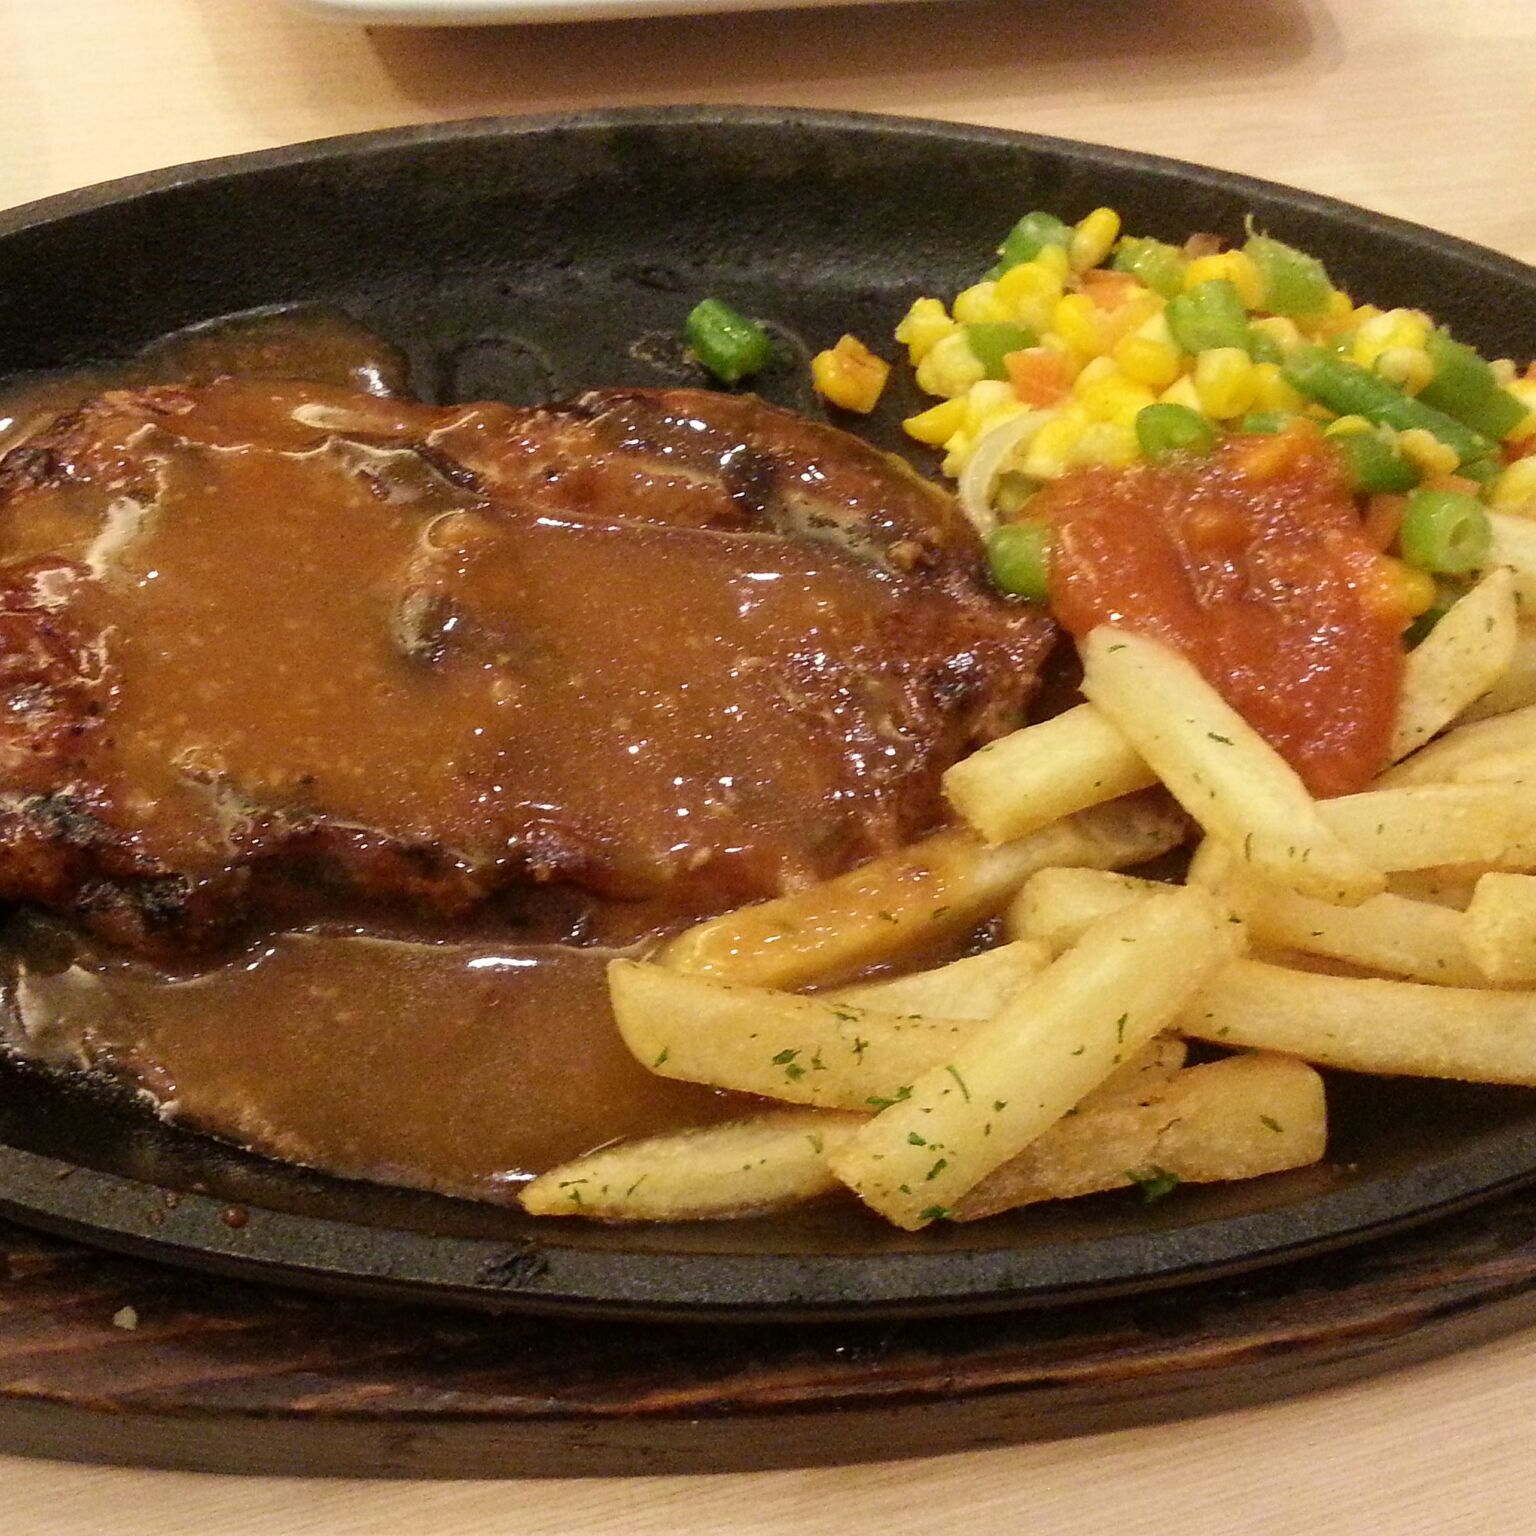 Steak 21 Steak, Medan, Meat